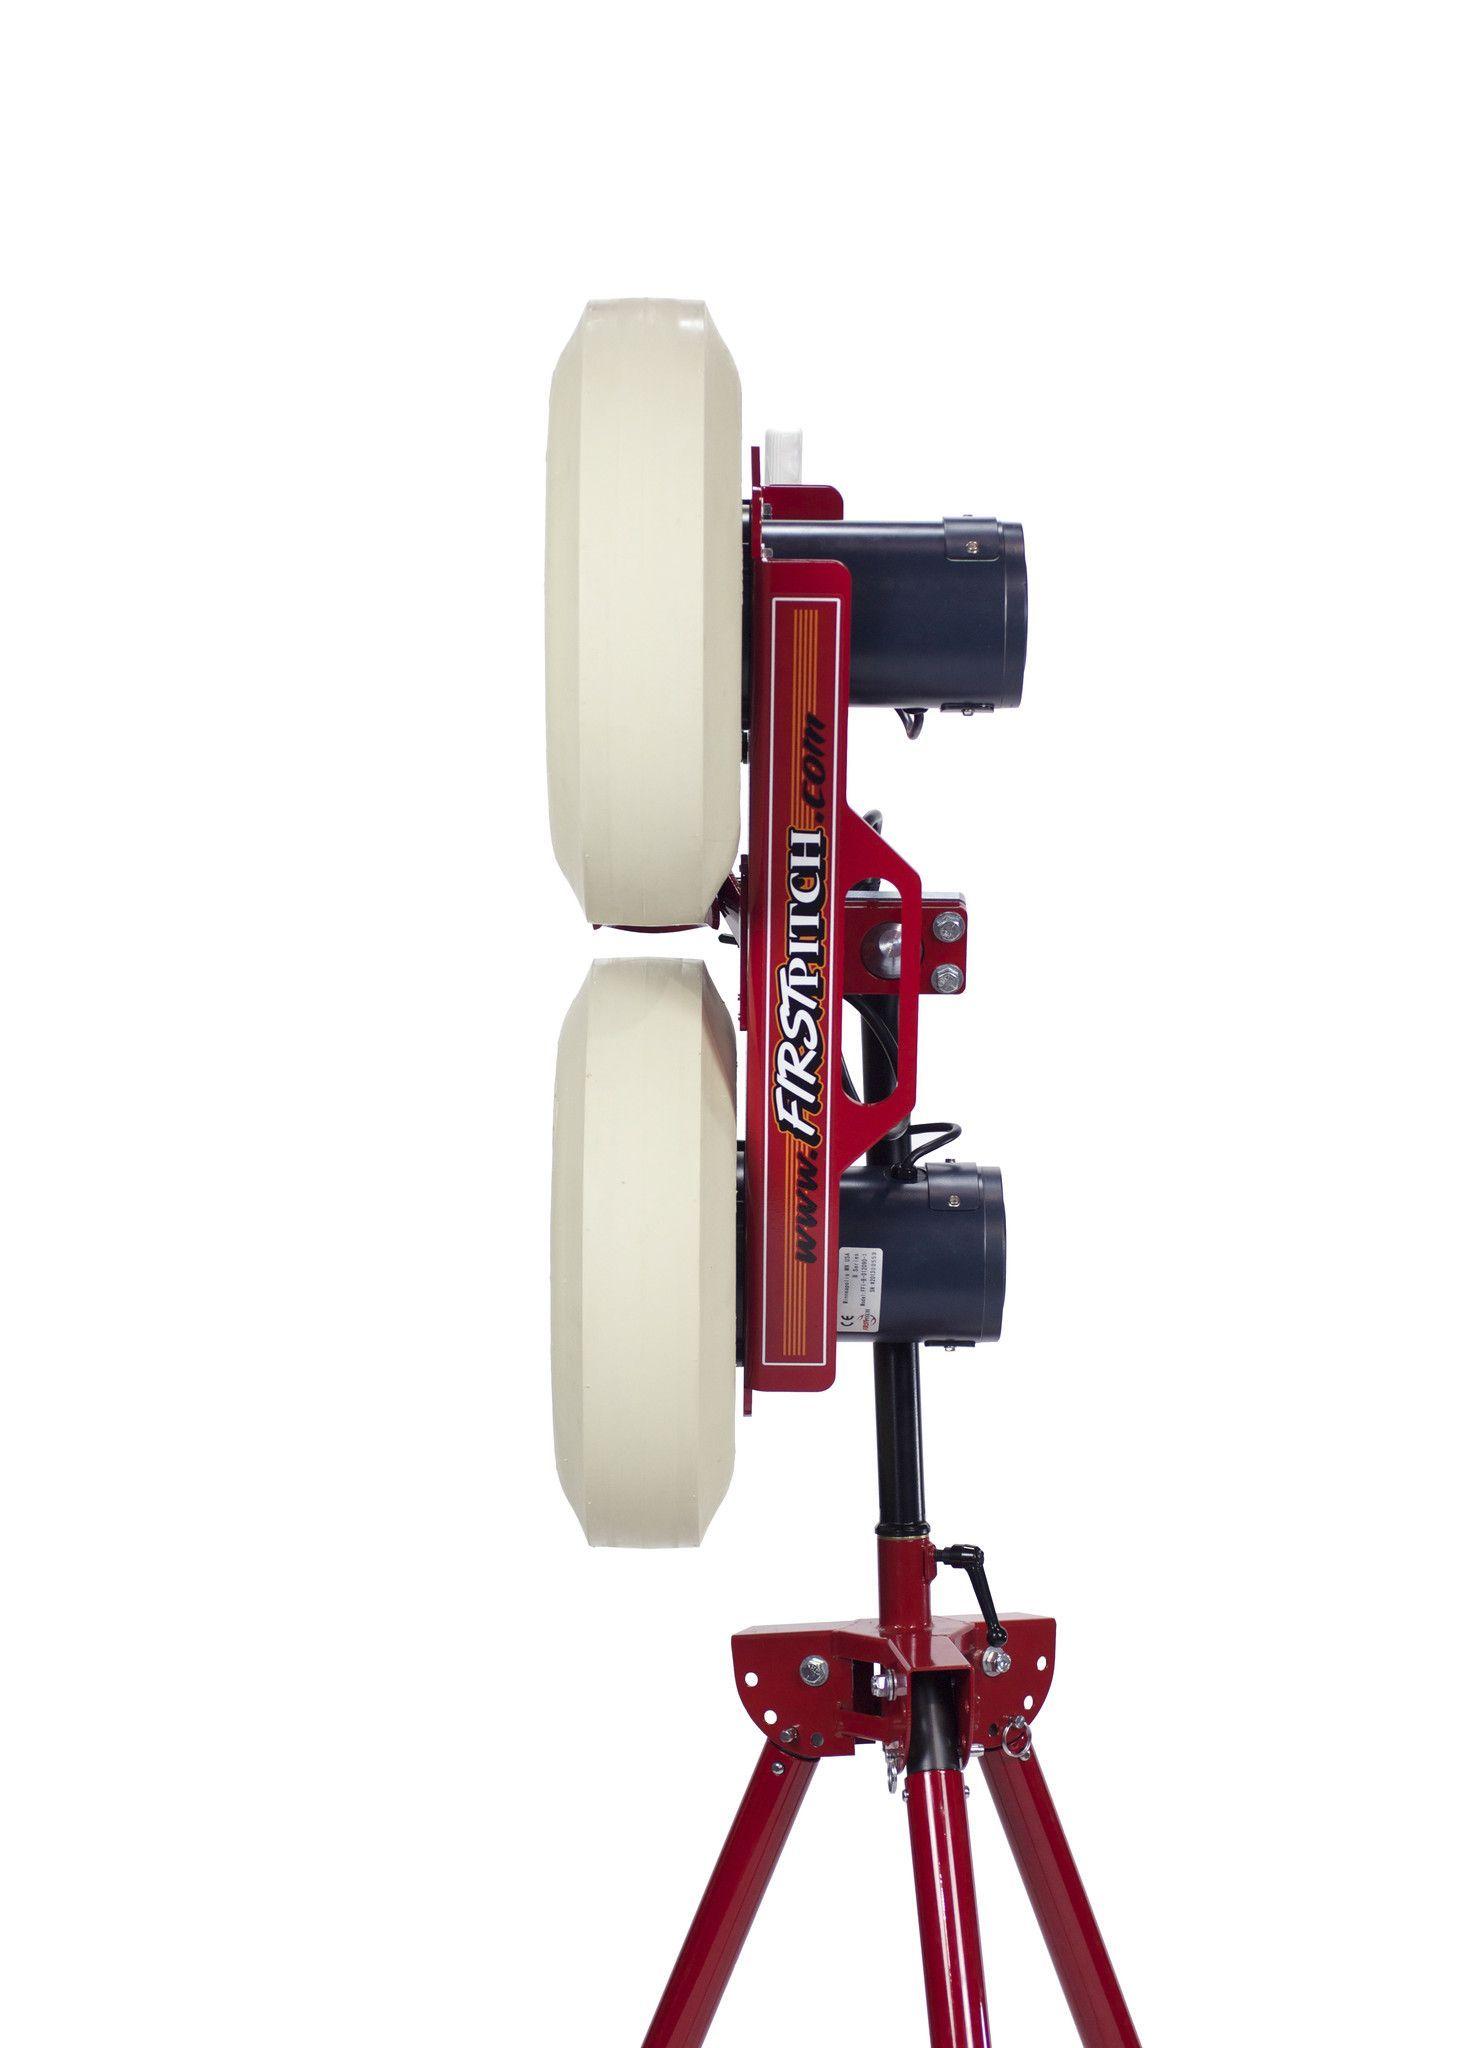 First Pitch Dual Wheel Curveball Pitching Machine Baseball